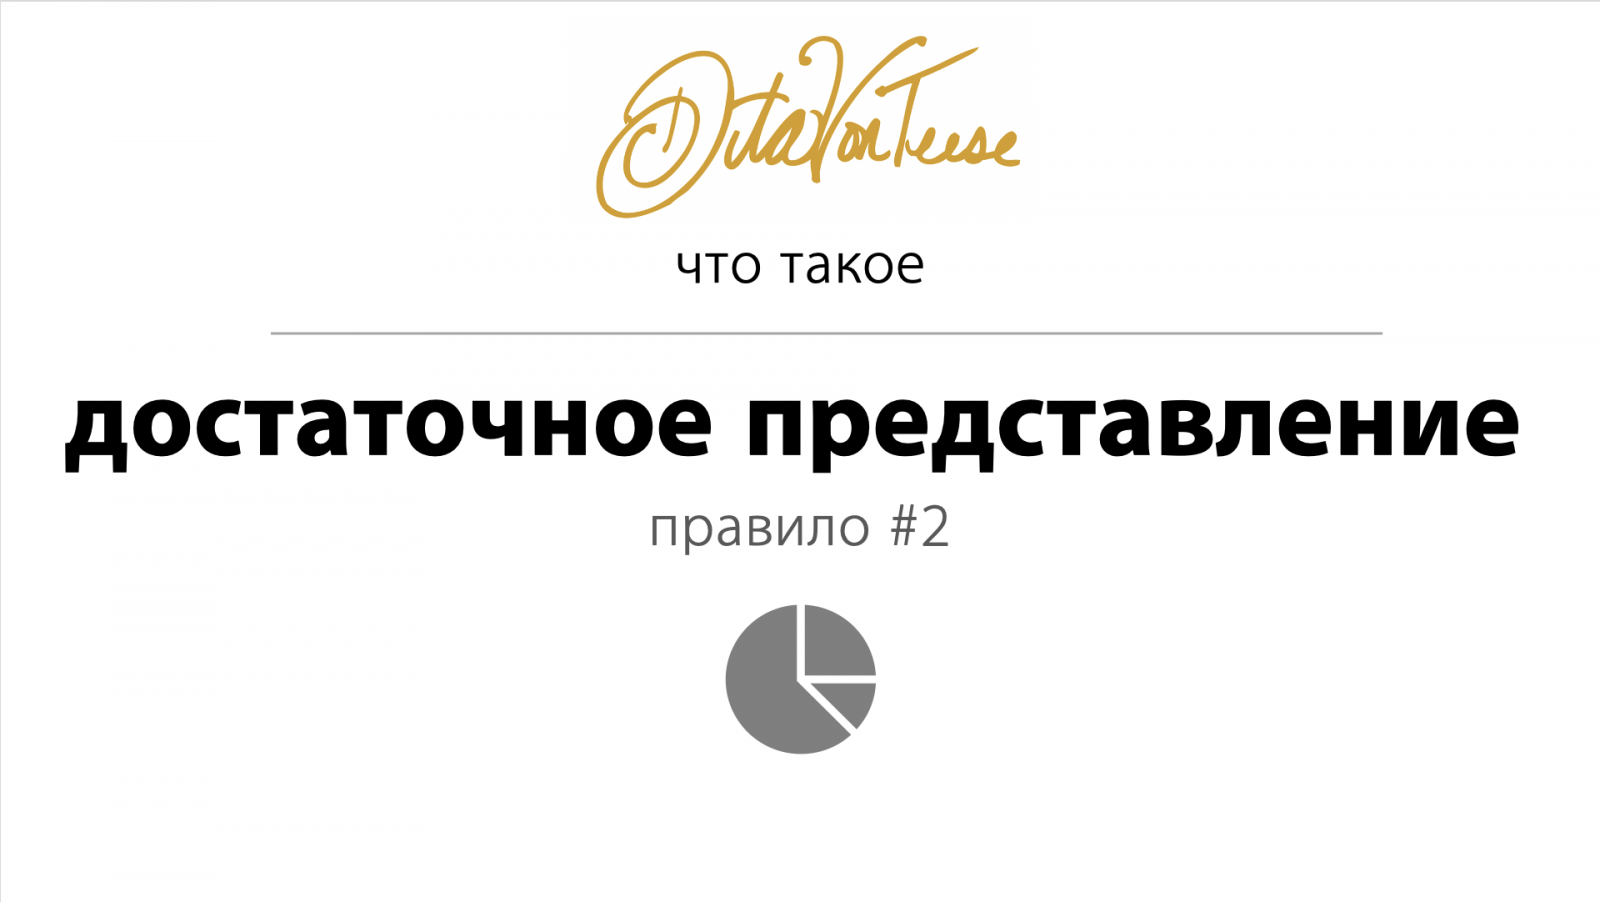 DVT31 - DITA VON TEESE